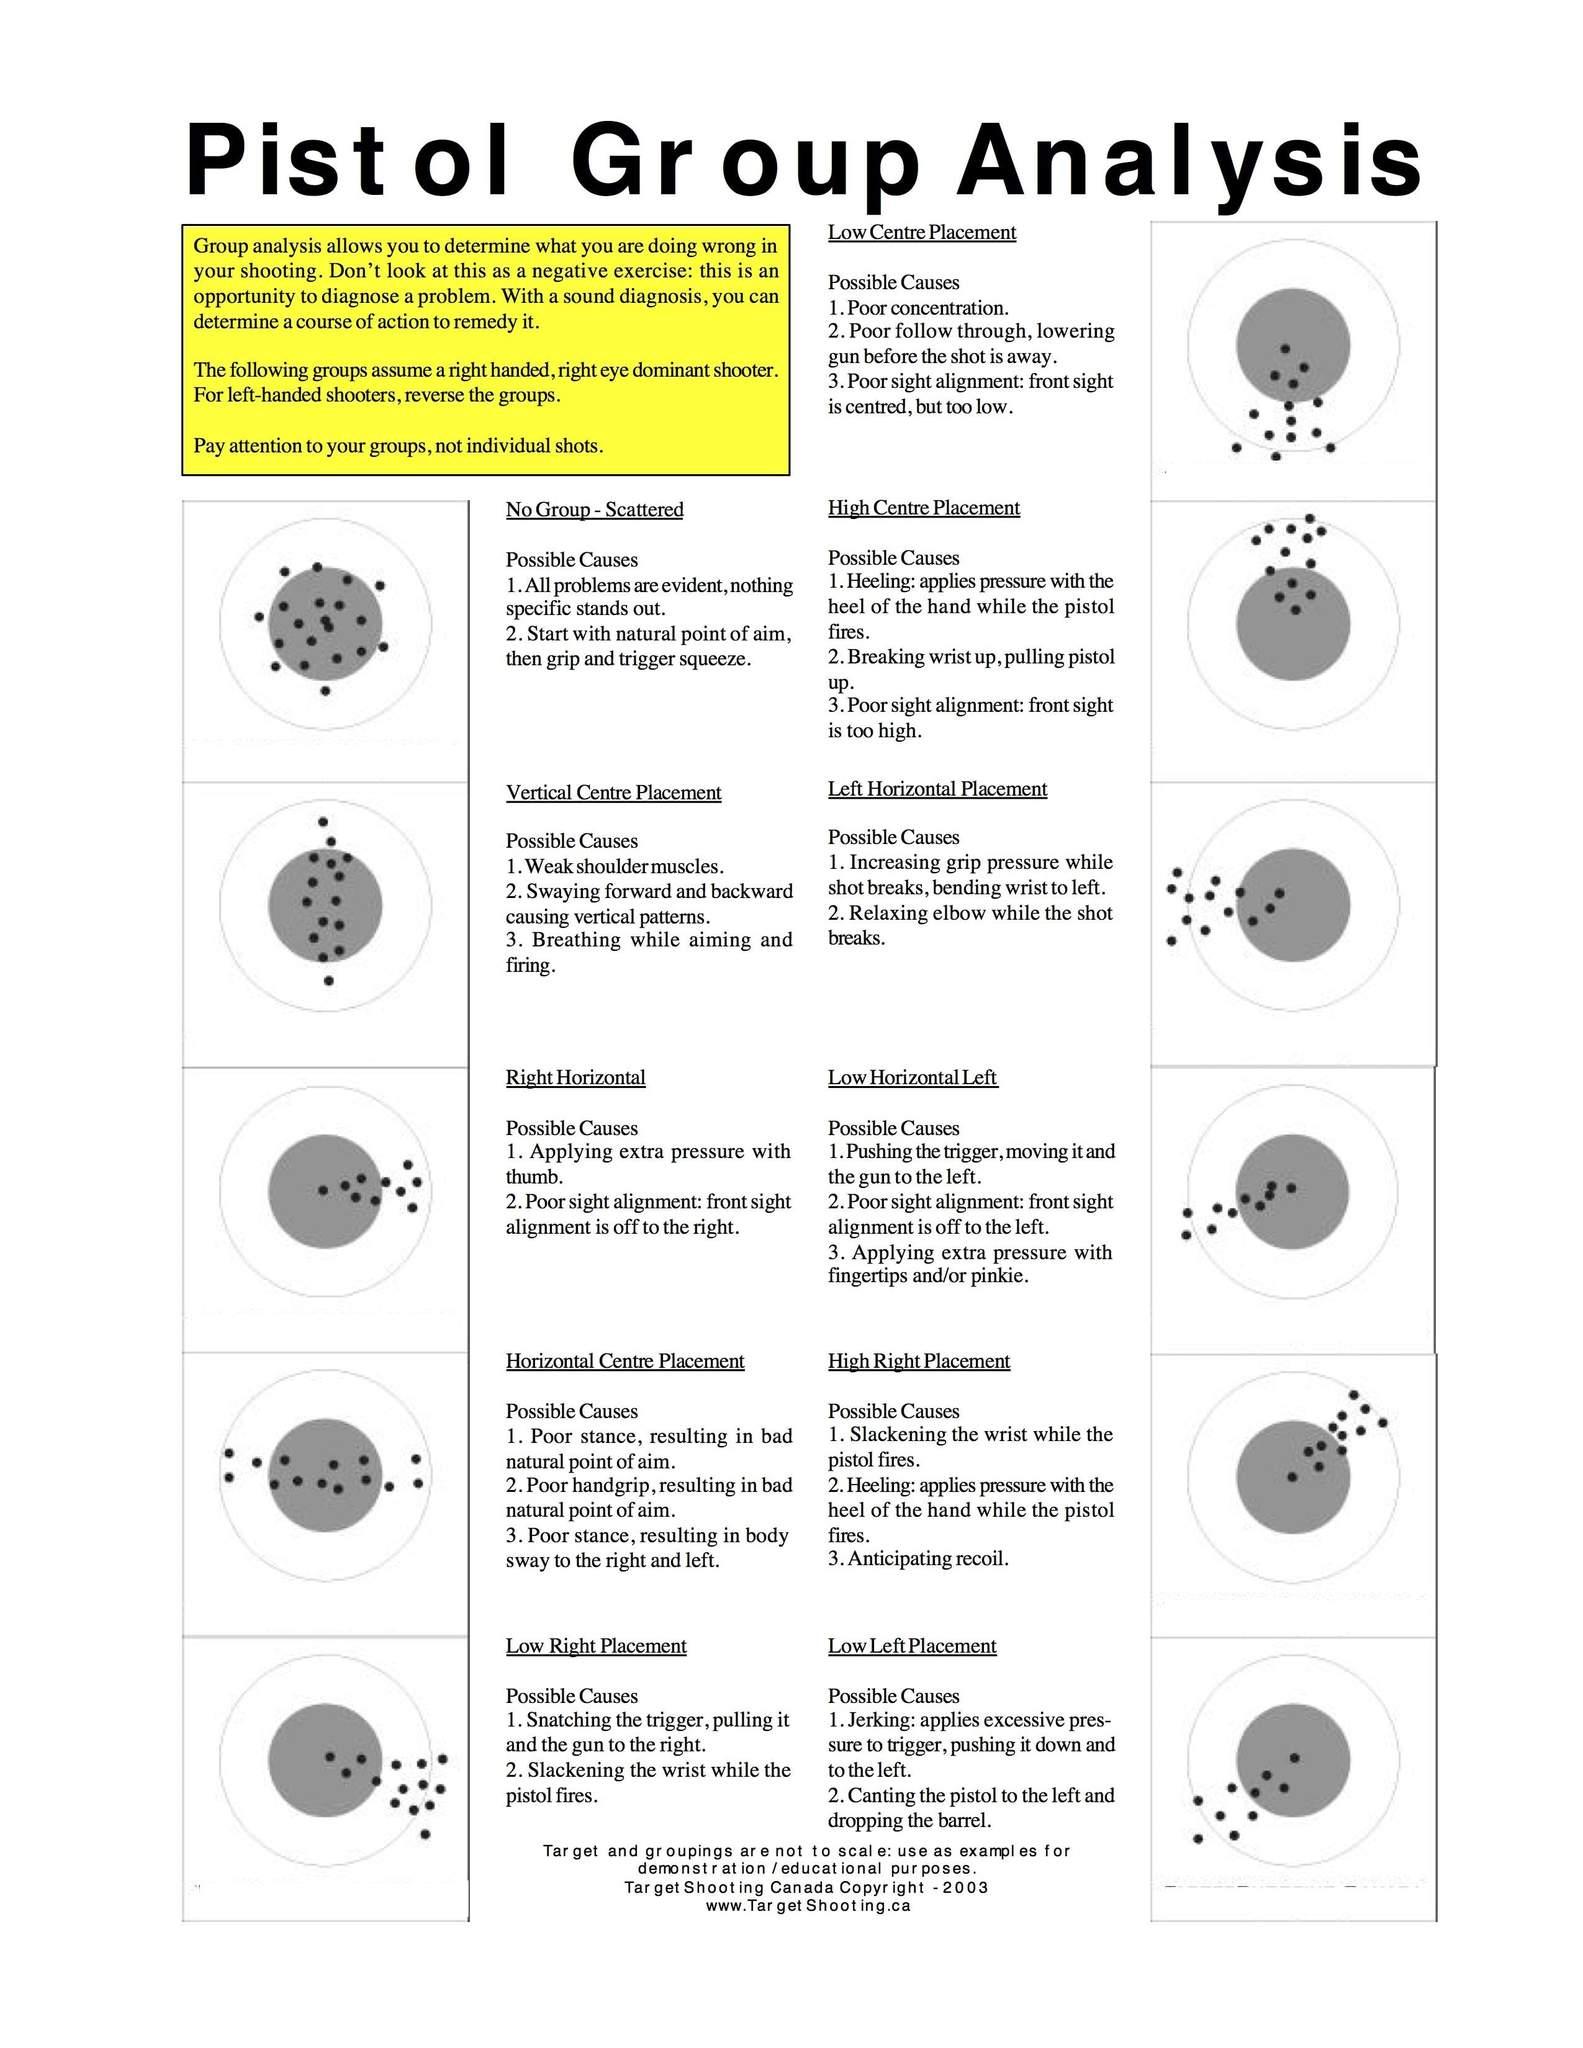 grp-analysis3_1_593c250b-88aa-42ad-a0c1-e4510c1b2a1e_2048x2048.jpg